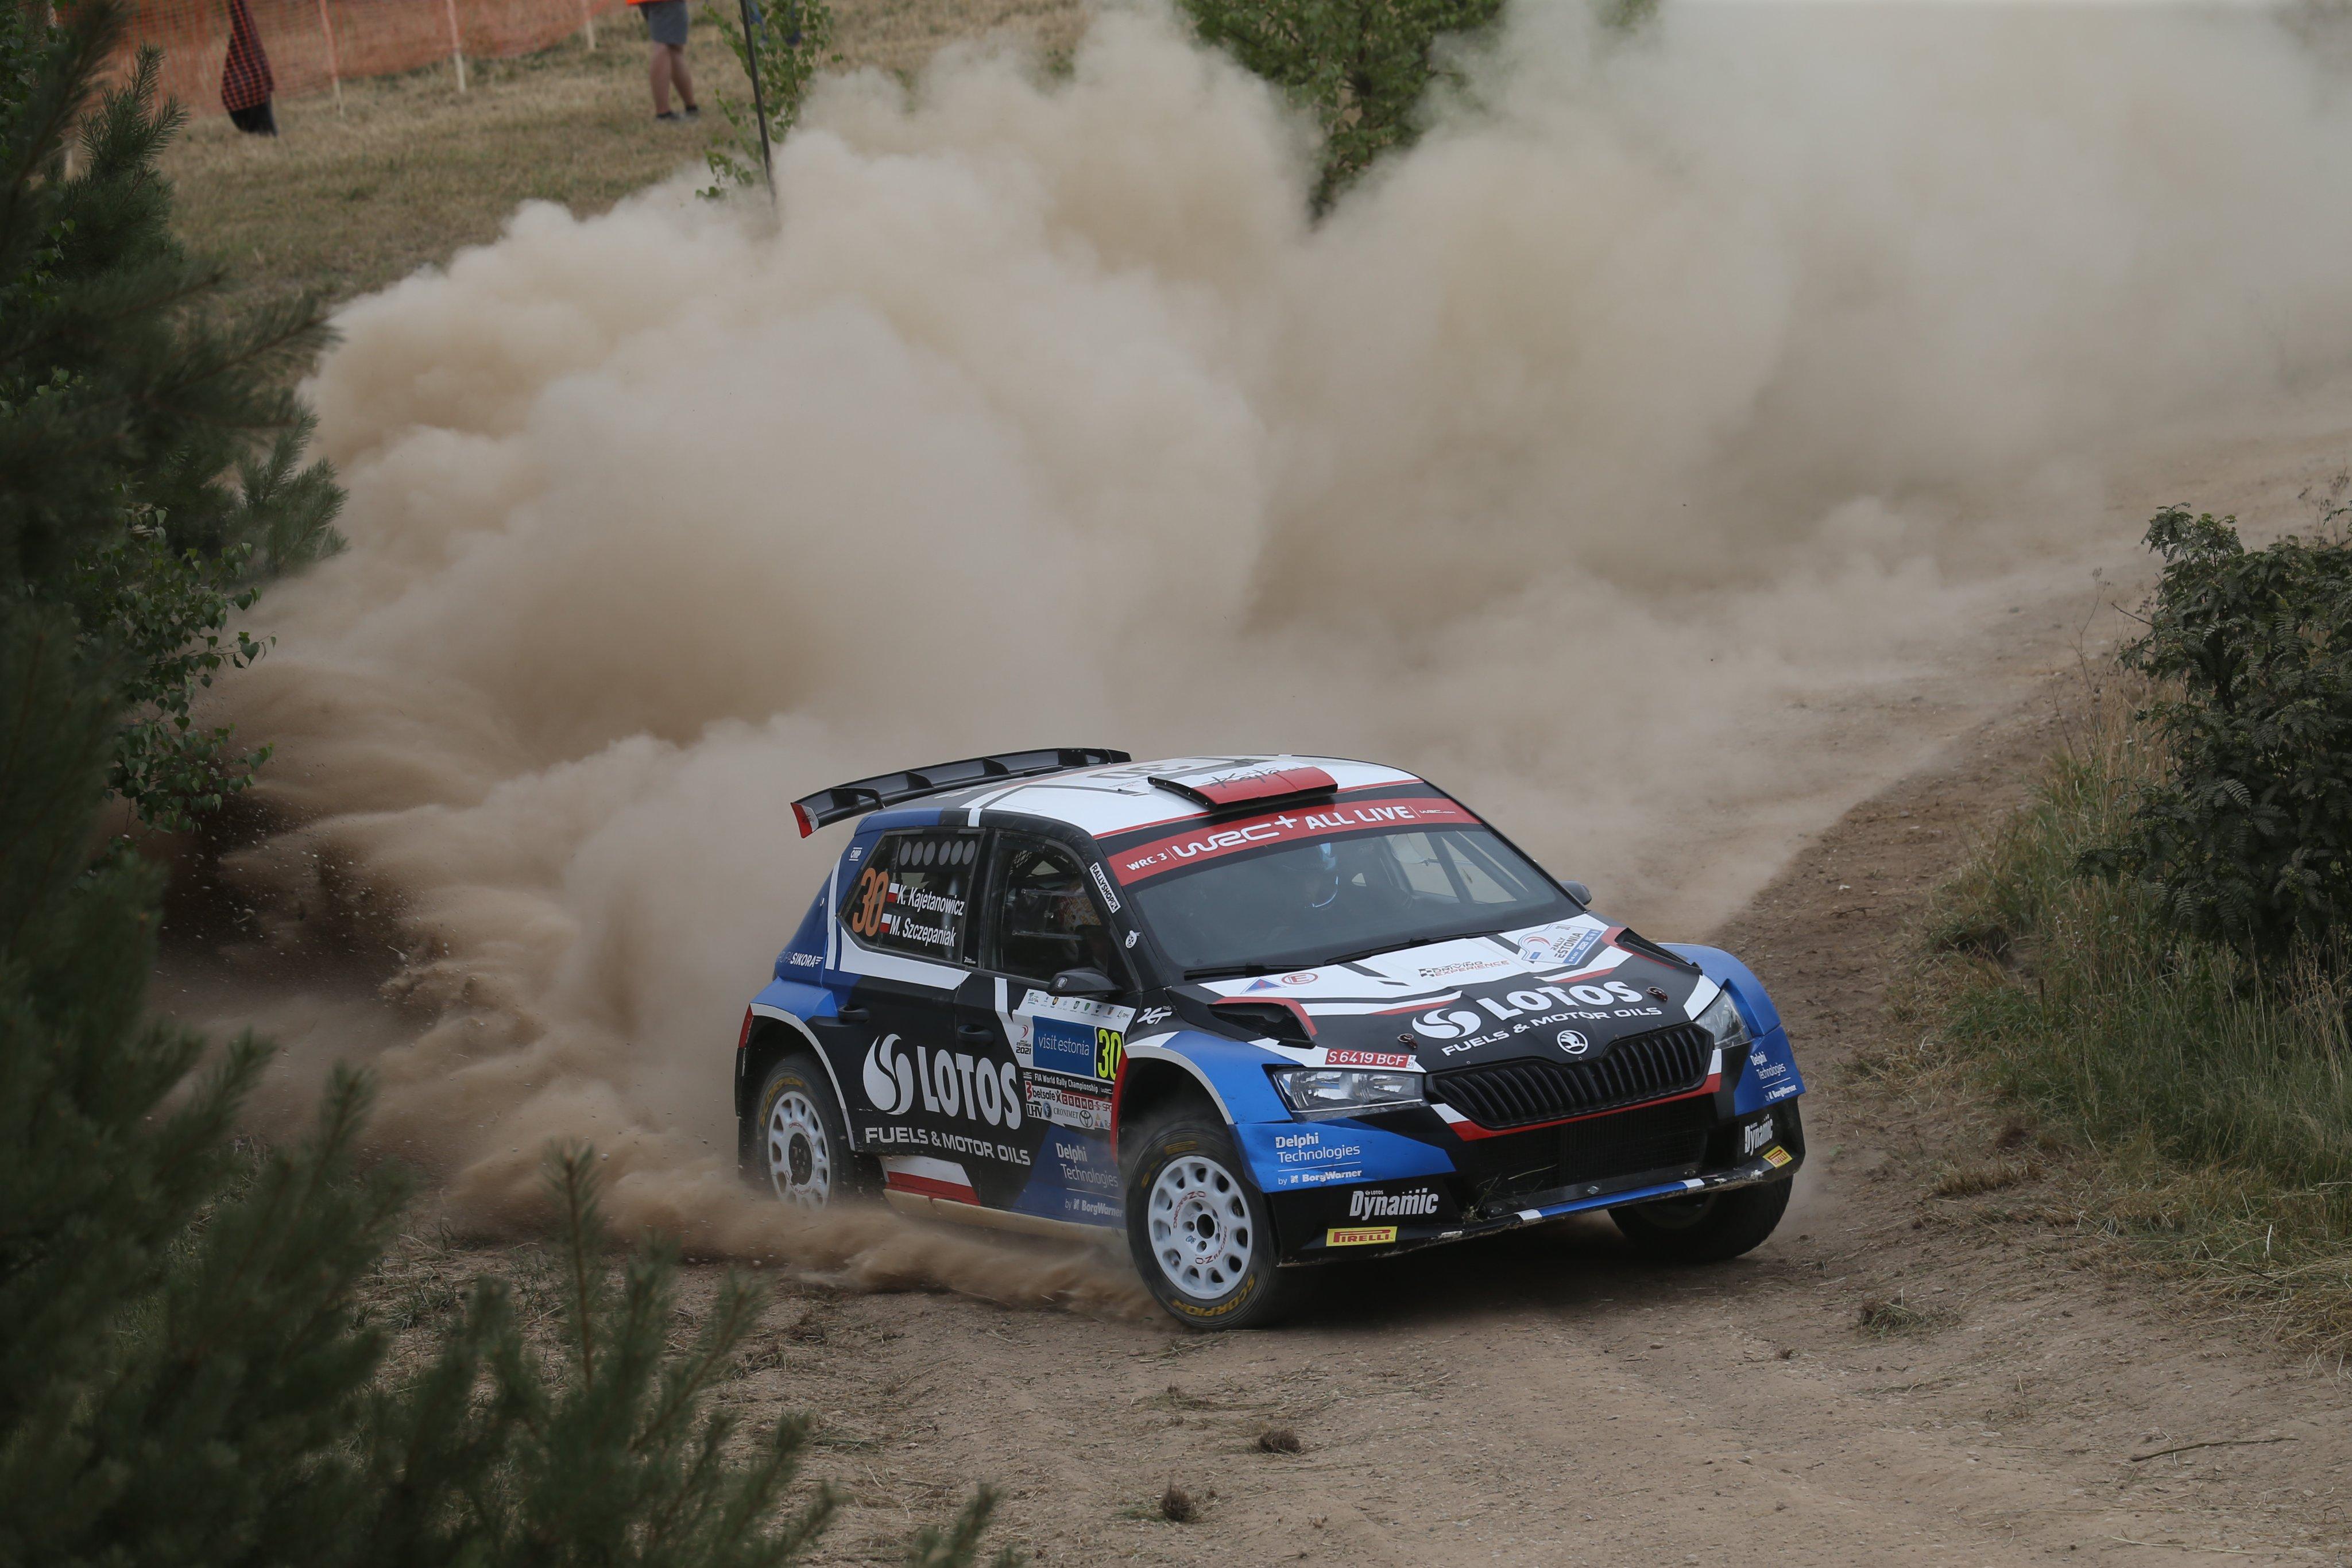 WRC: 11º Rally Estonia [15-18 Julio] - Página 3 E6j5aTyX0AEG2j9?format=jpg&name=4096x4096